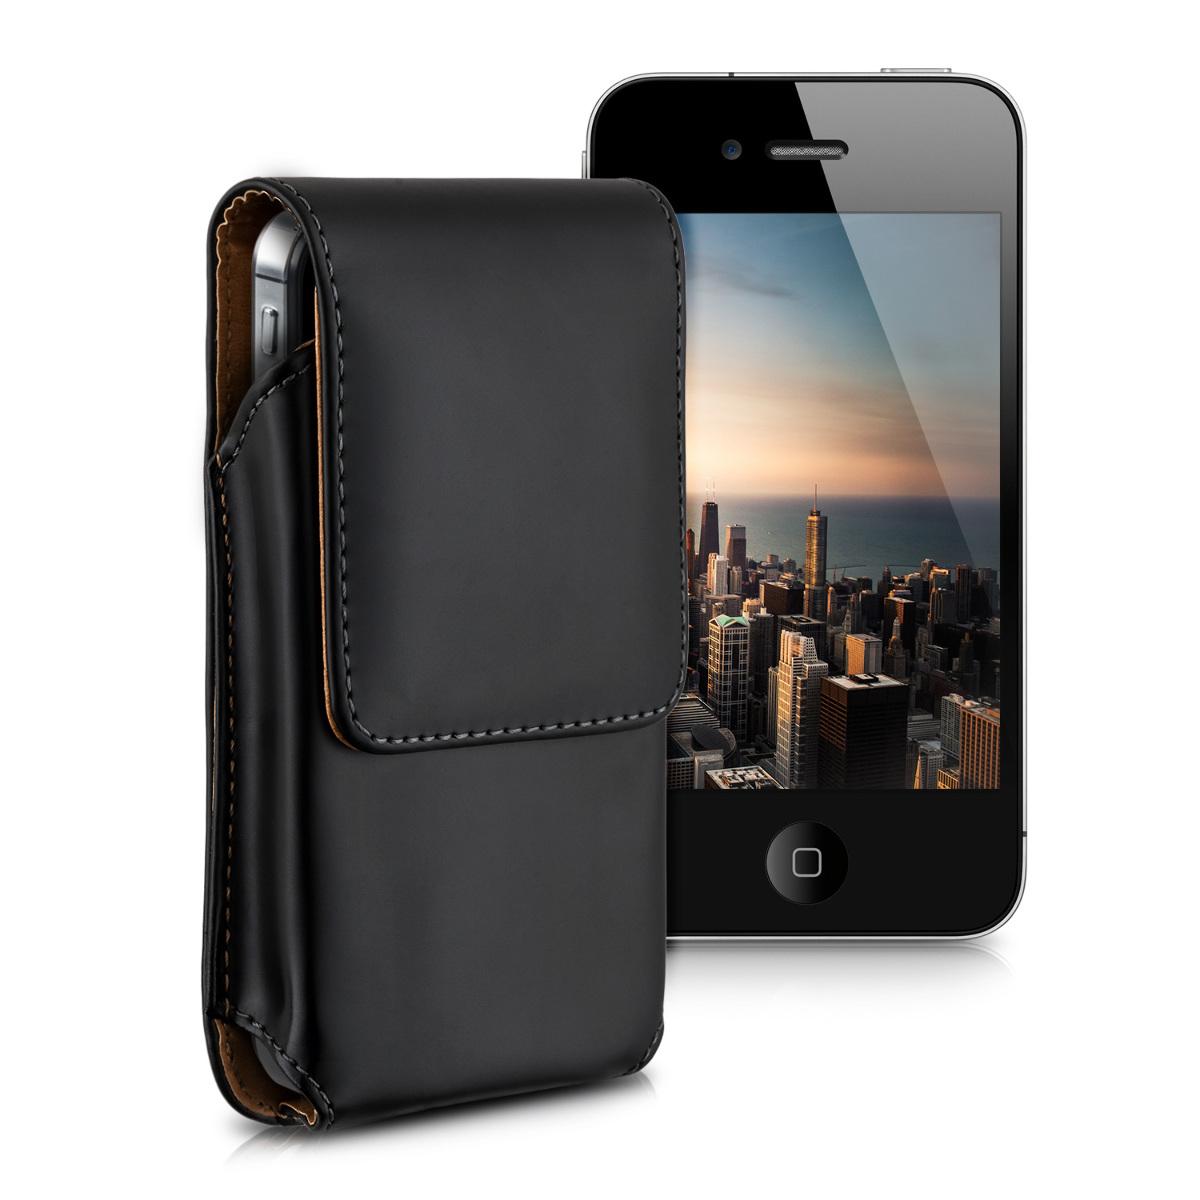 KW Universal Θήκη Ζώνης για Smartphones - Black (20314.2)